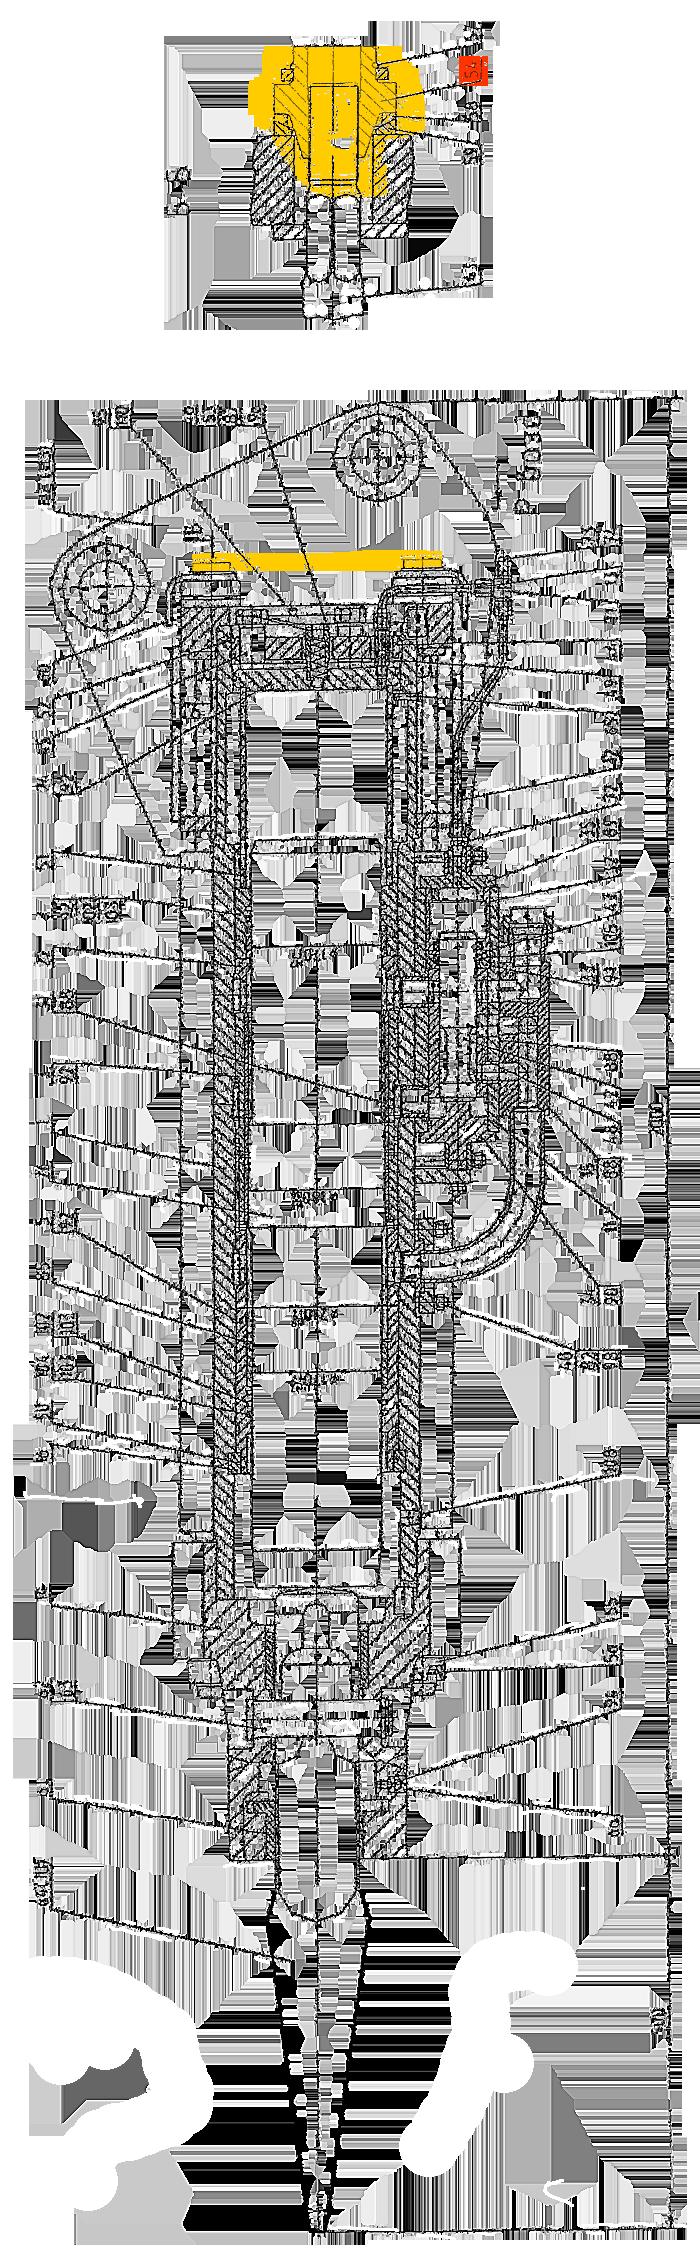 Гайка натяжная СП-71А.022.1.063 гидромолота МГ-300